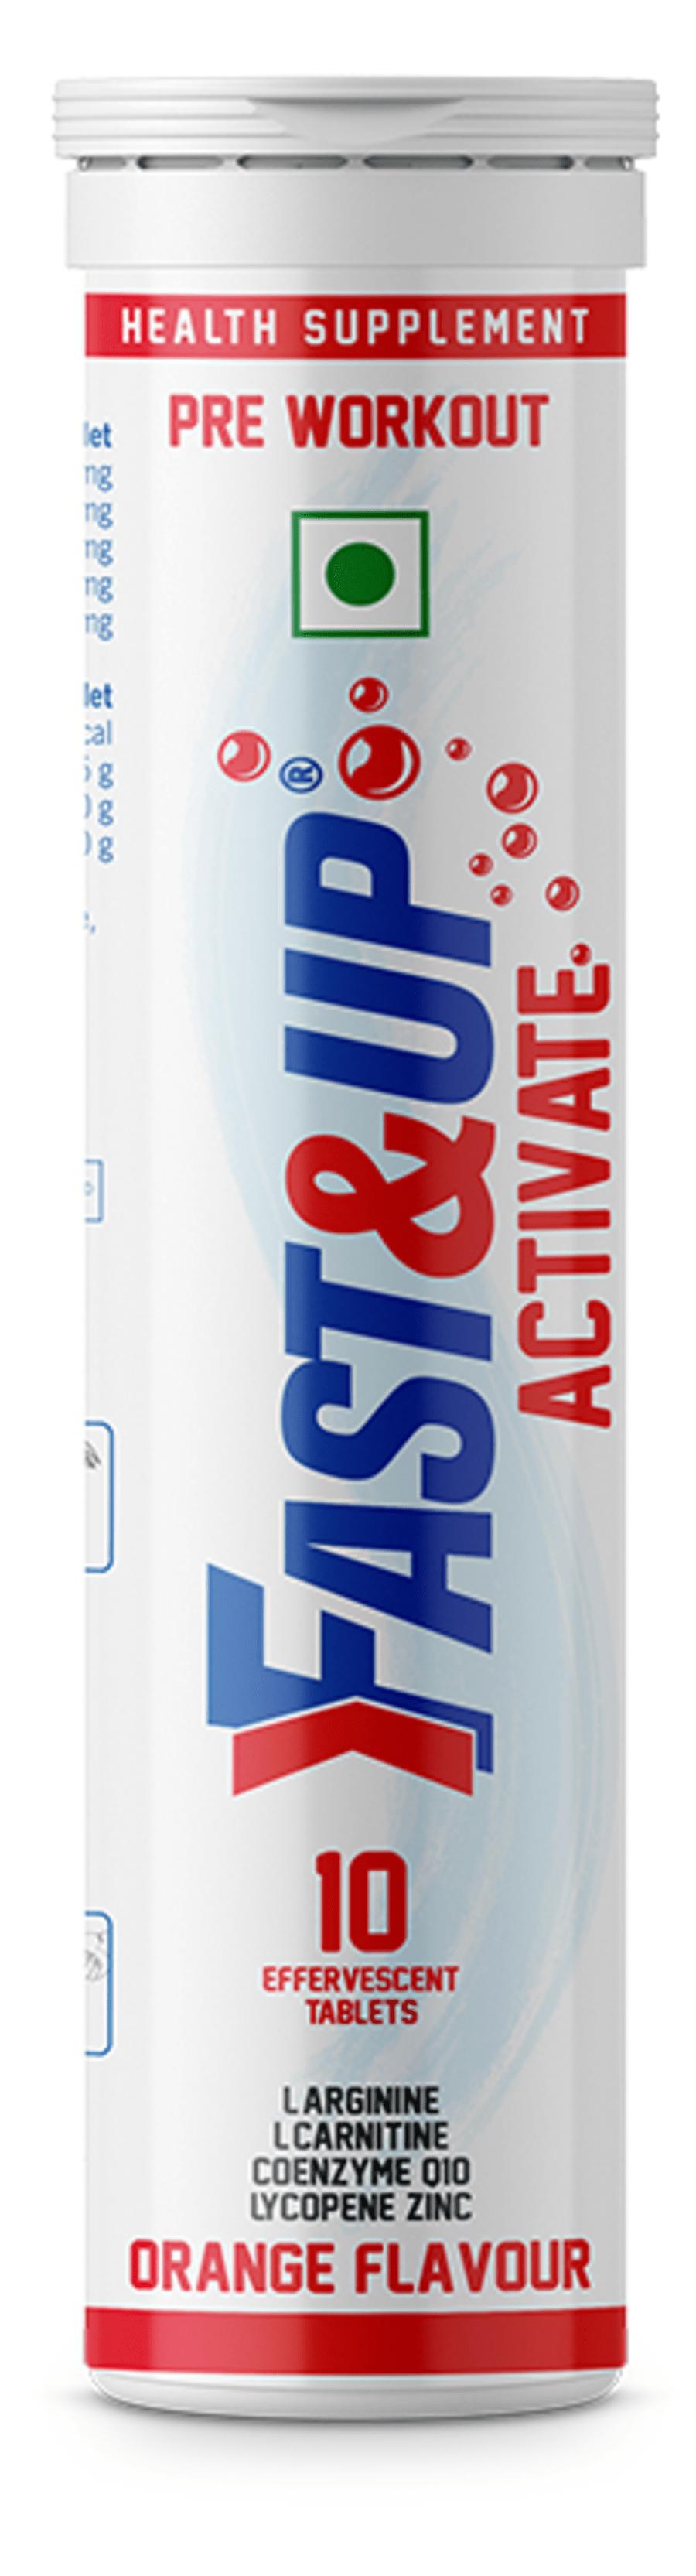 Fast&up Activate Pre Workout - 10 Effervescent Tablets - Orange Flavour